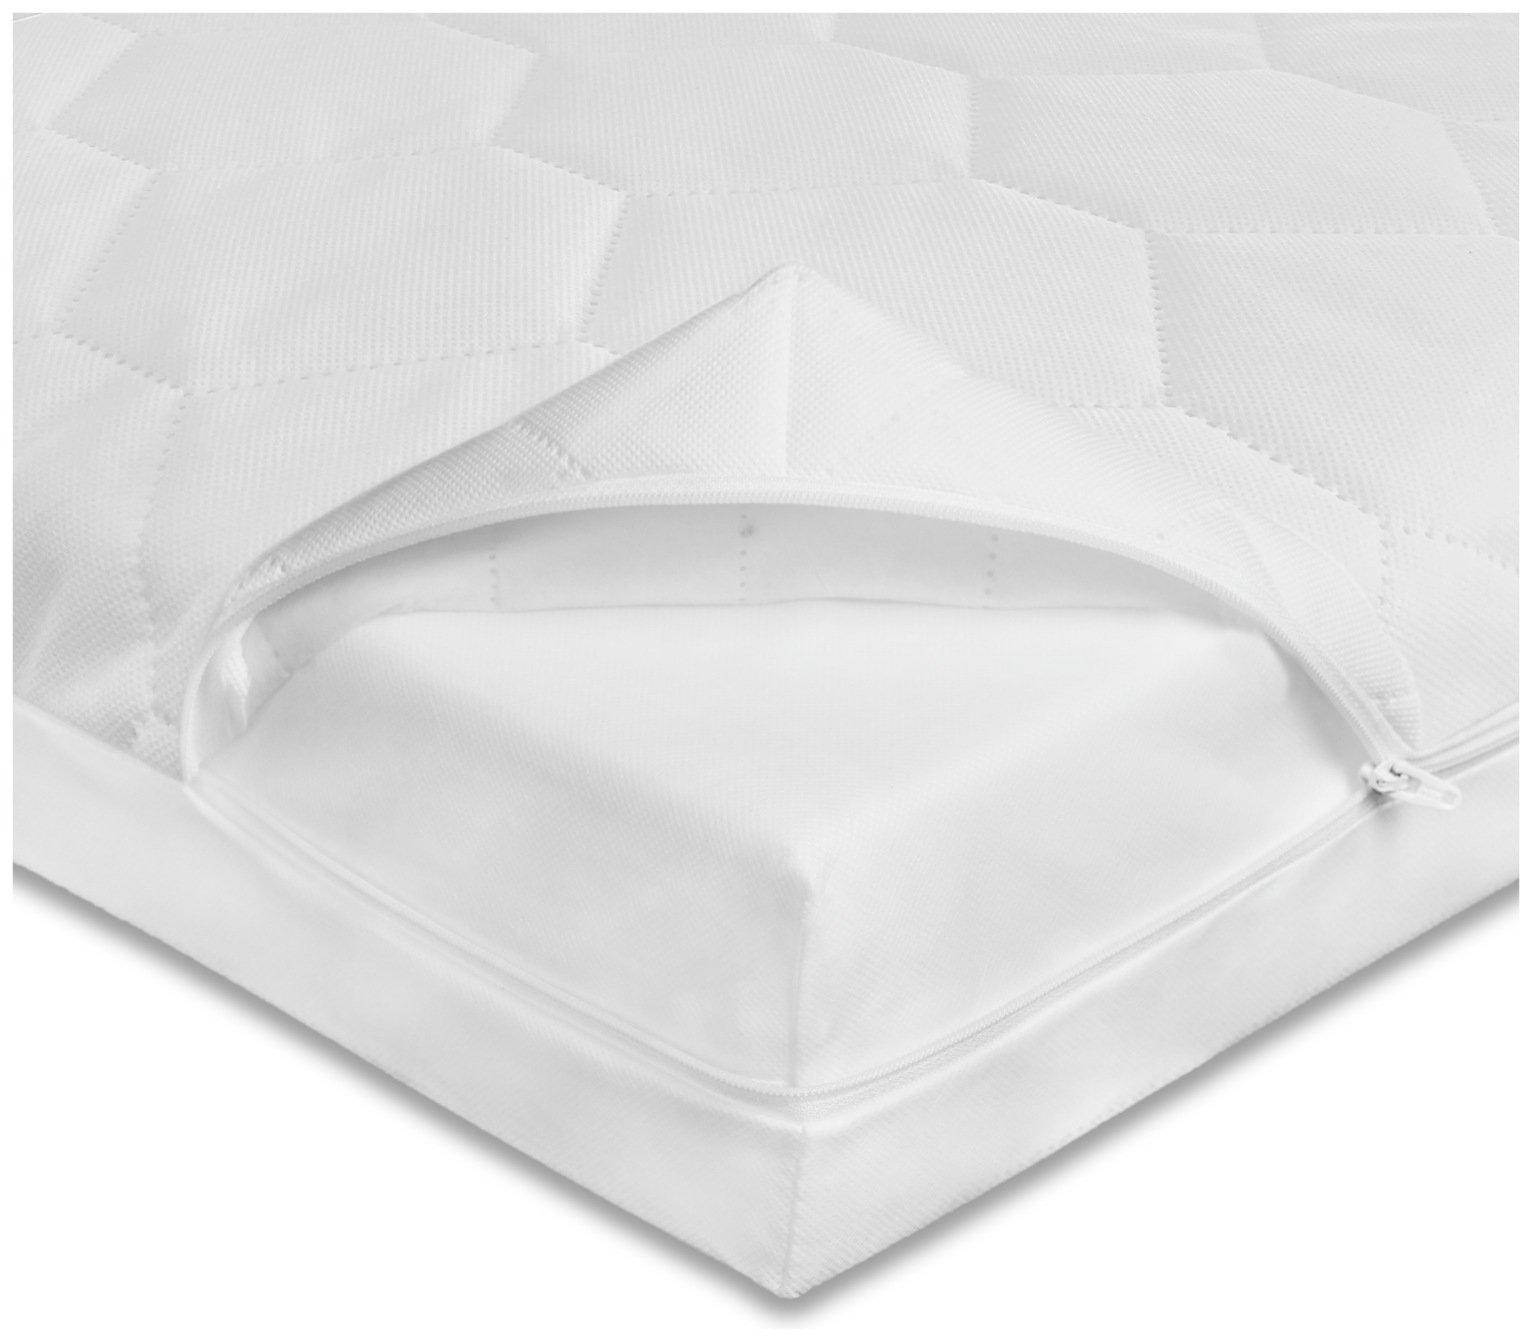 Mamas and papas 140 x 70cm sprung cot bed mattress